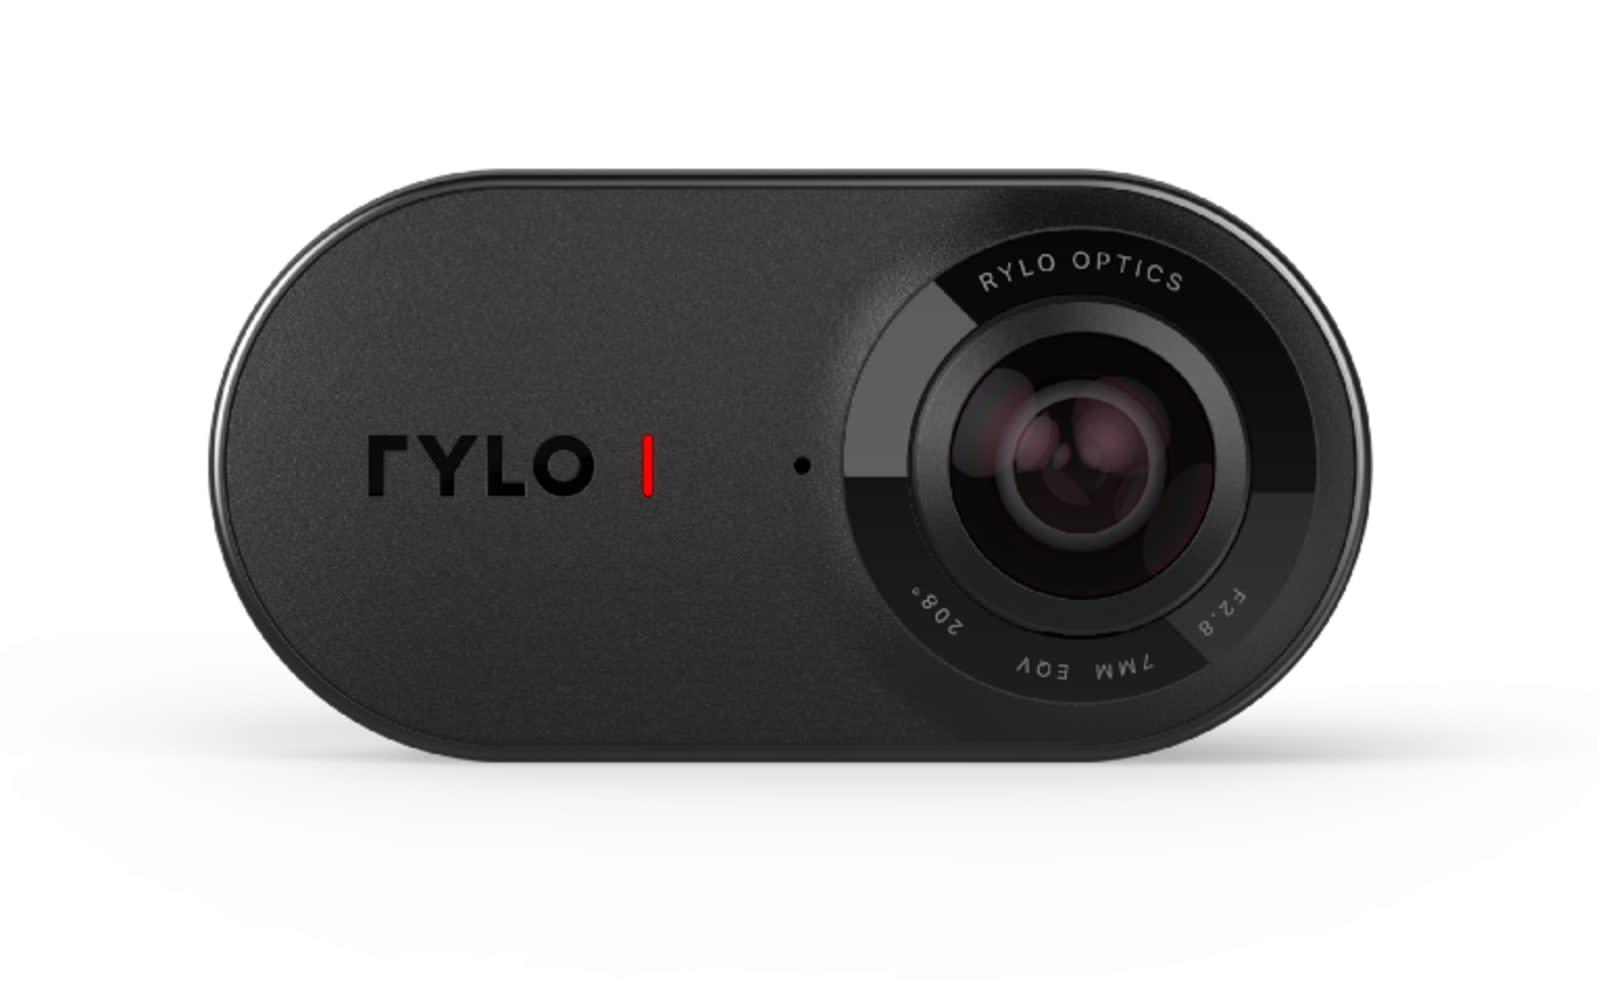 VSCO buys 360 camera company Rylo to create mobile editing tools